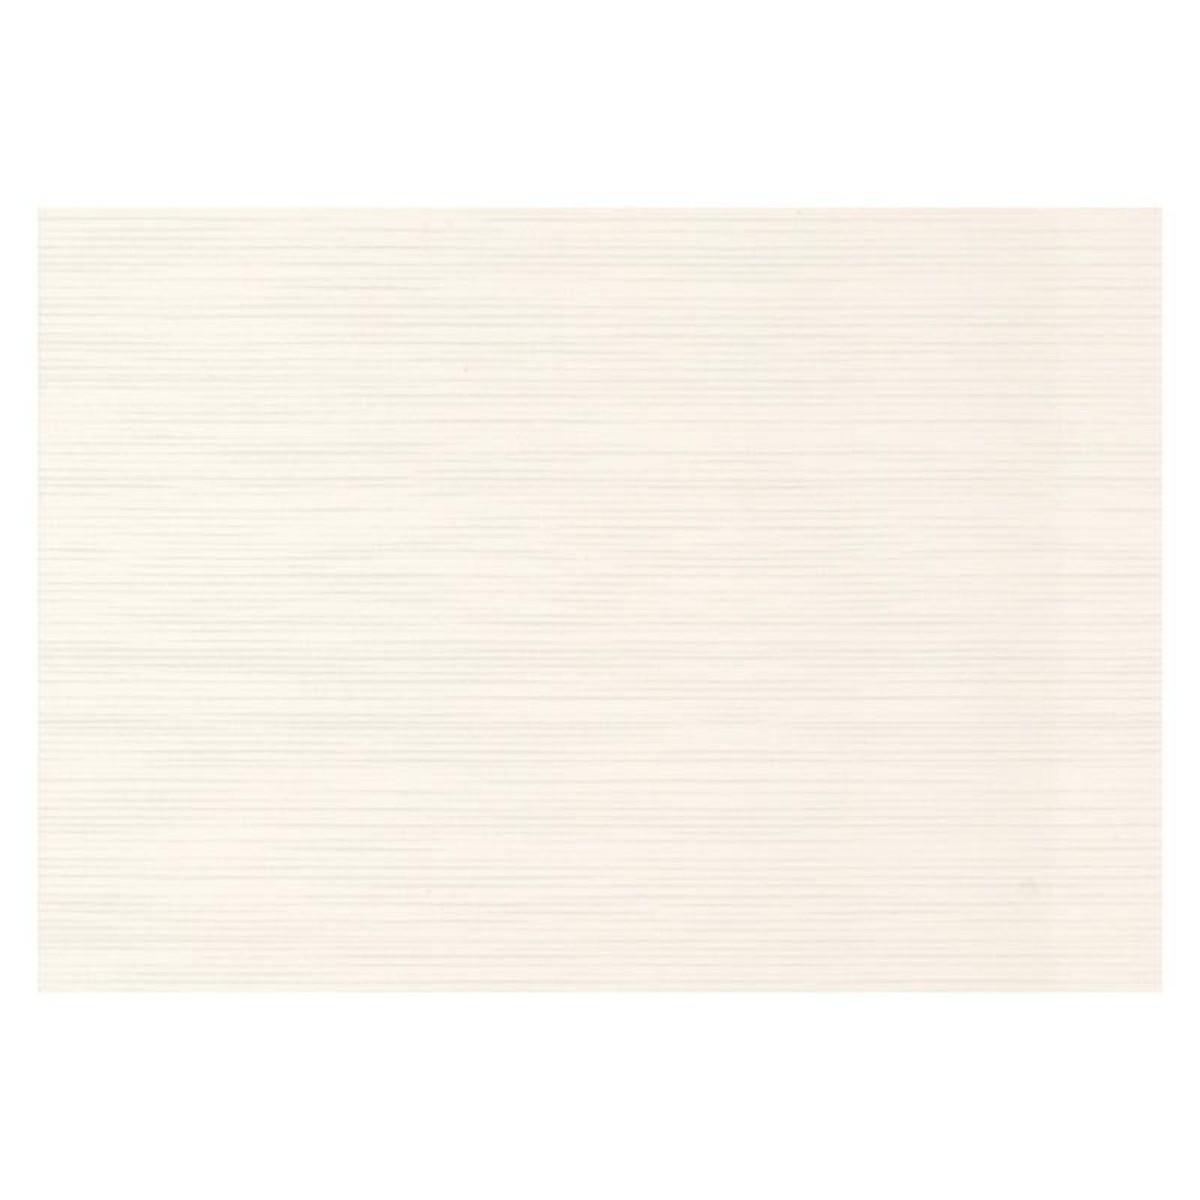 Плитка настенная White 20х30 см 1.08 м2